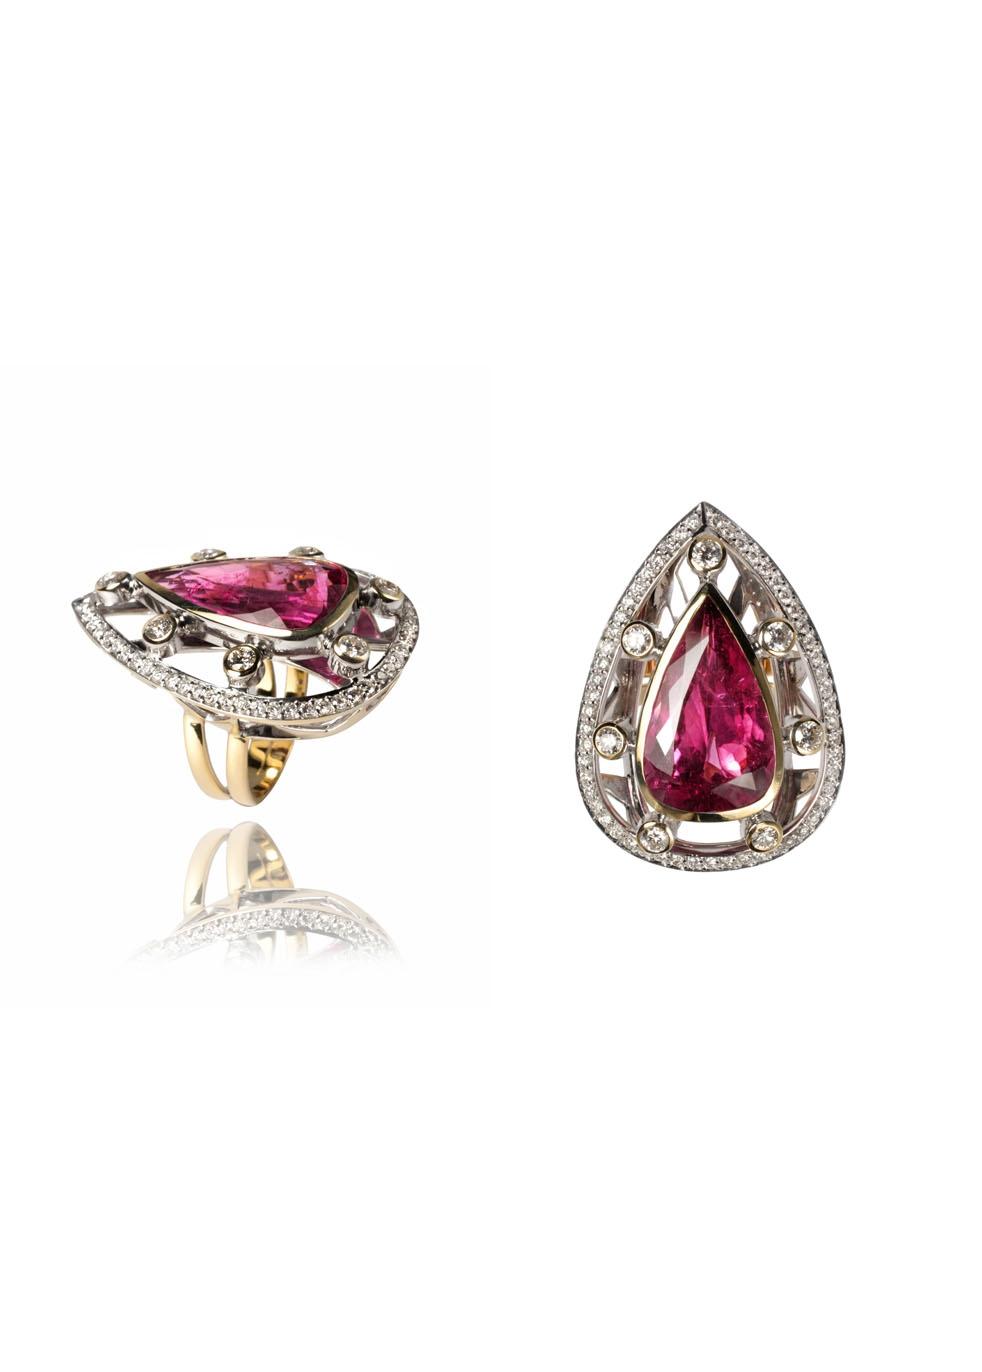 ARA VARTANIAN Rubellite And Diamonds Ring